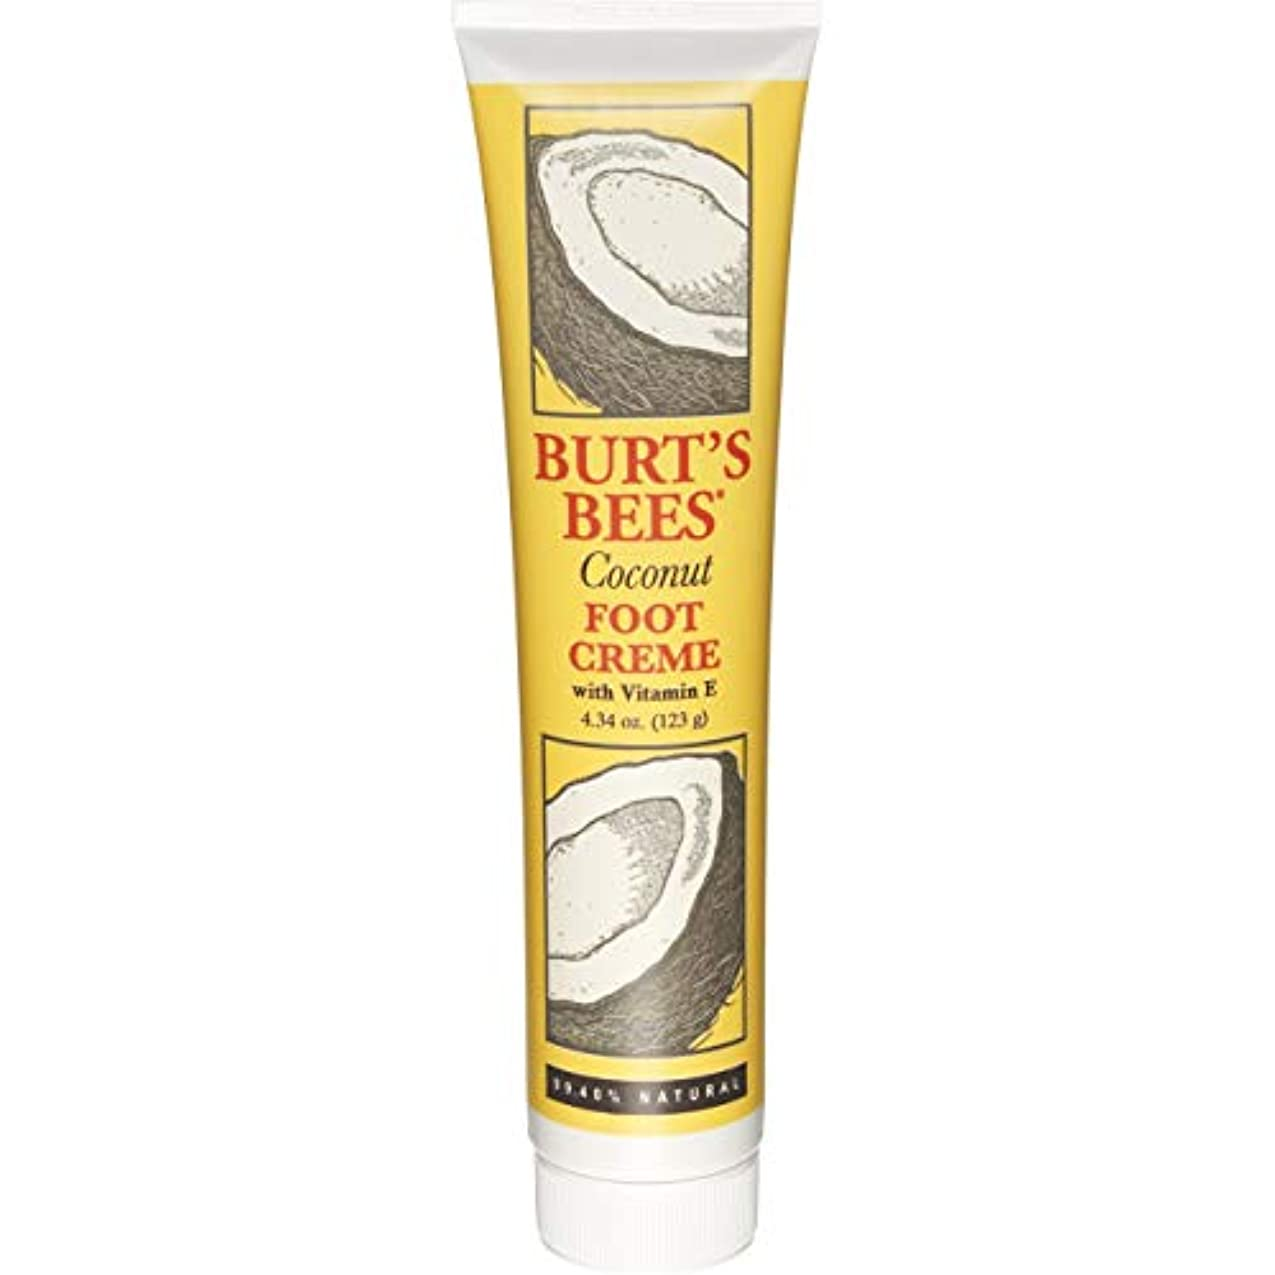 下着旅行者使用法Burt's Bees, Coconut Foot Creme 4oz by Burt's Bees